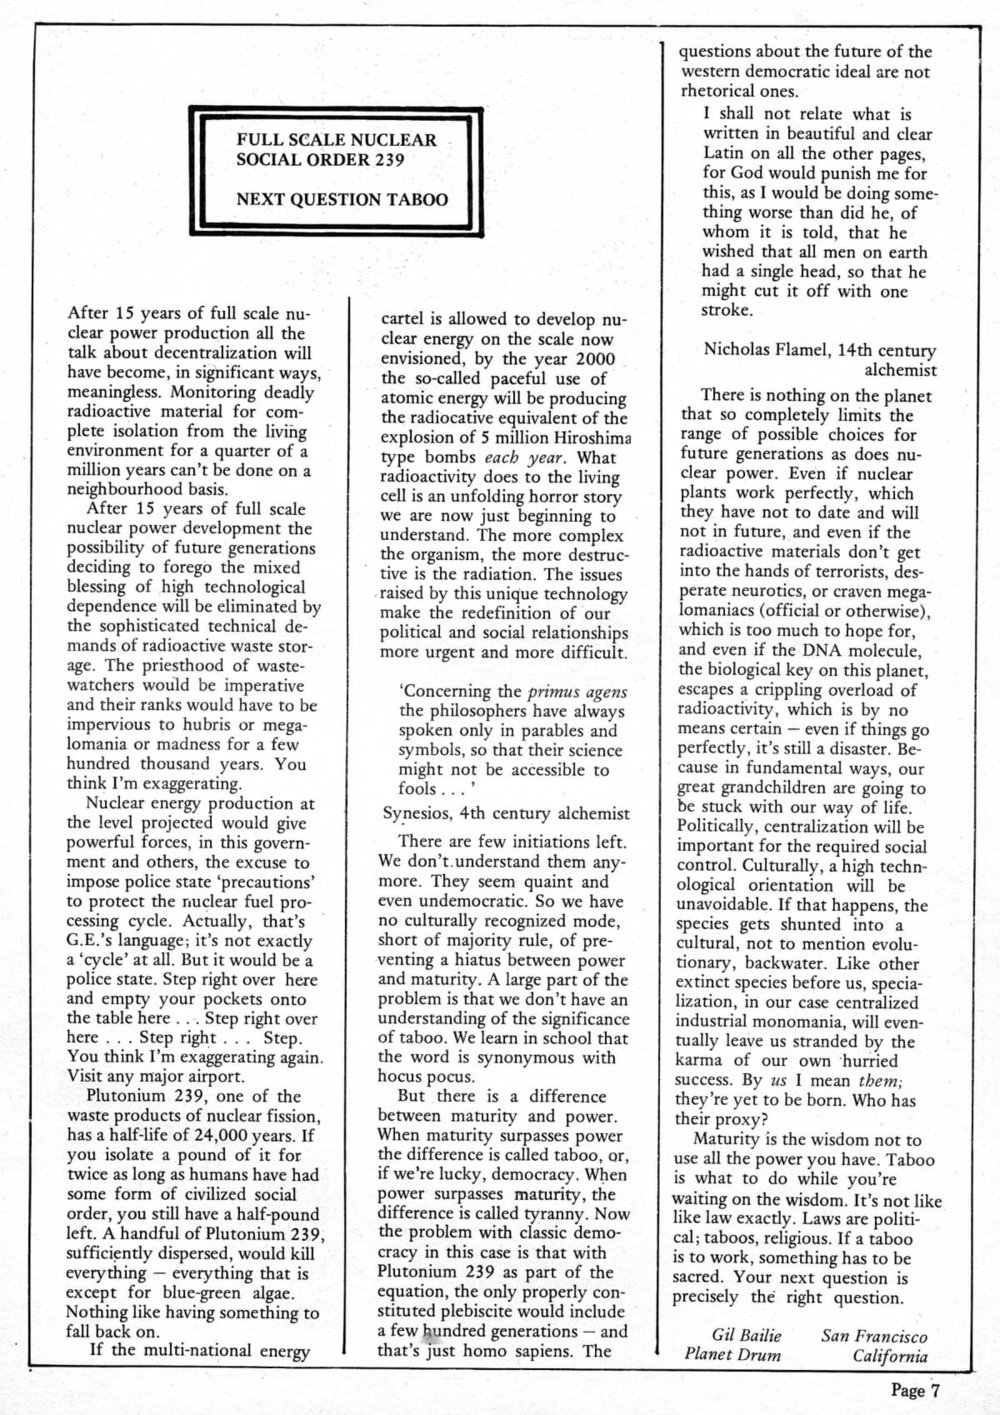 seed-v6-n1-jan1977-09.jpg